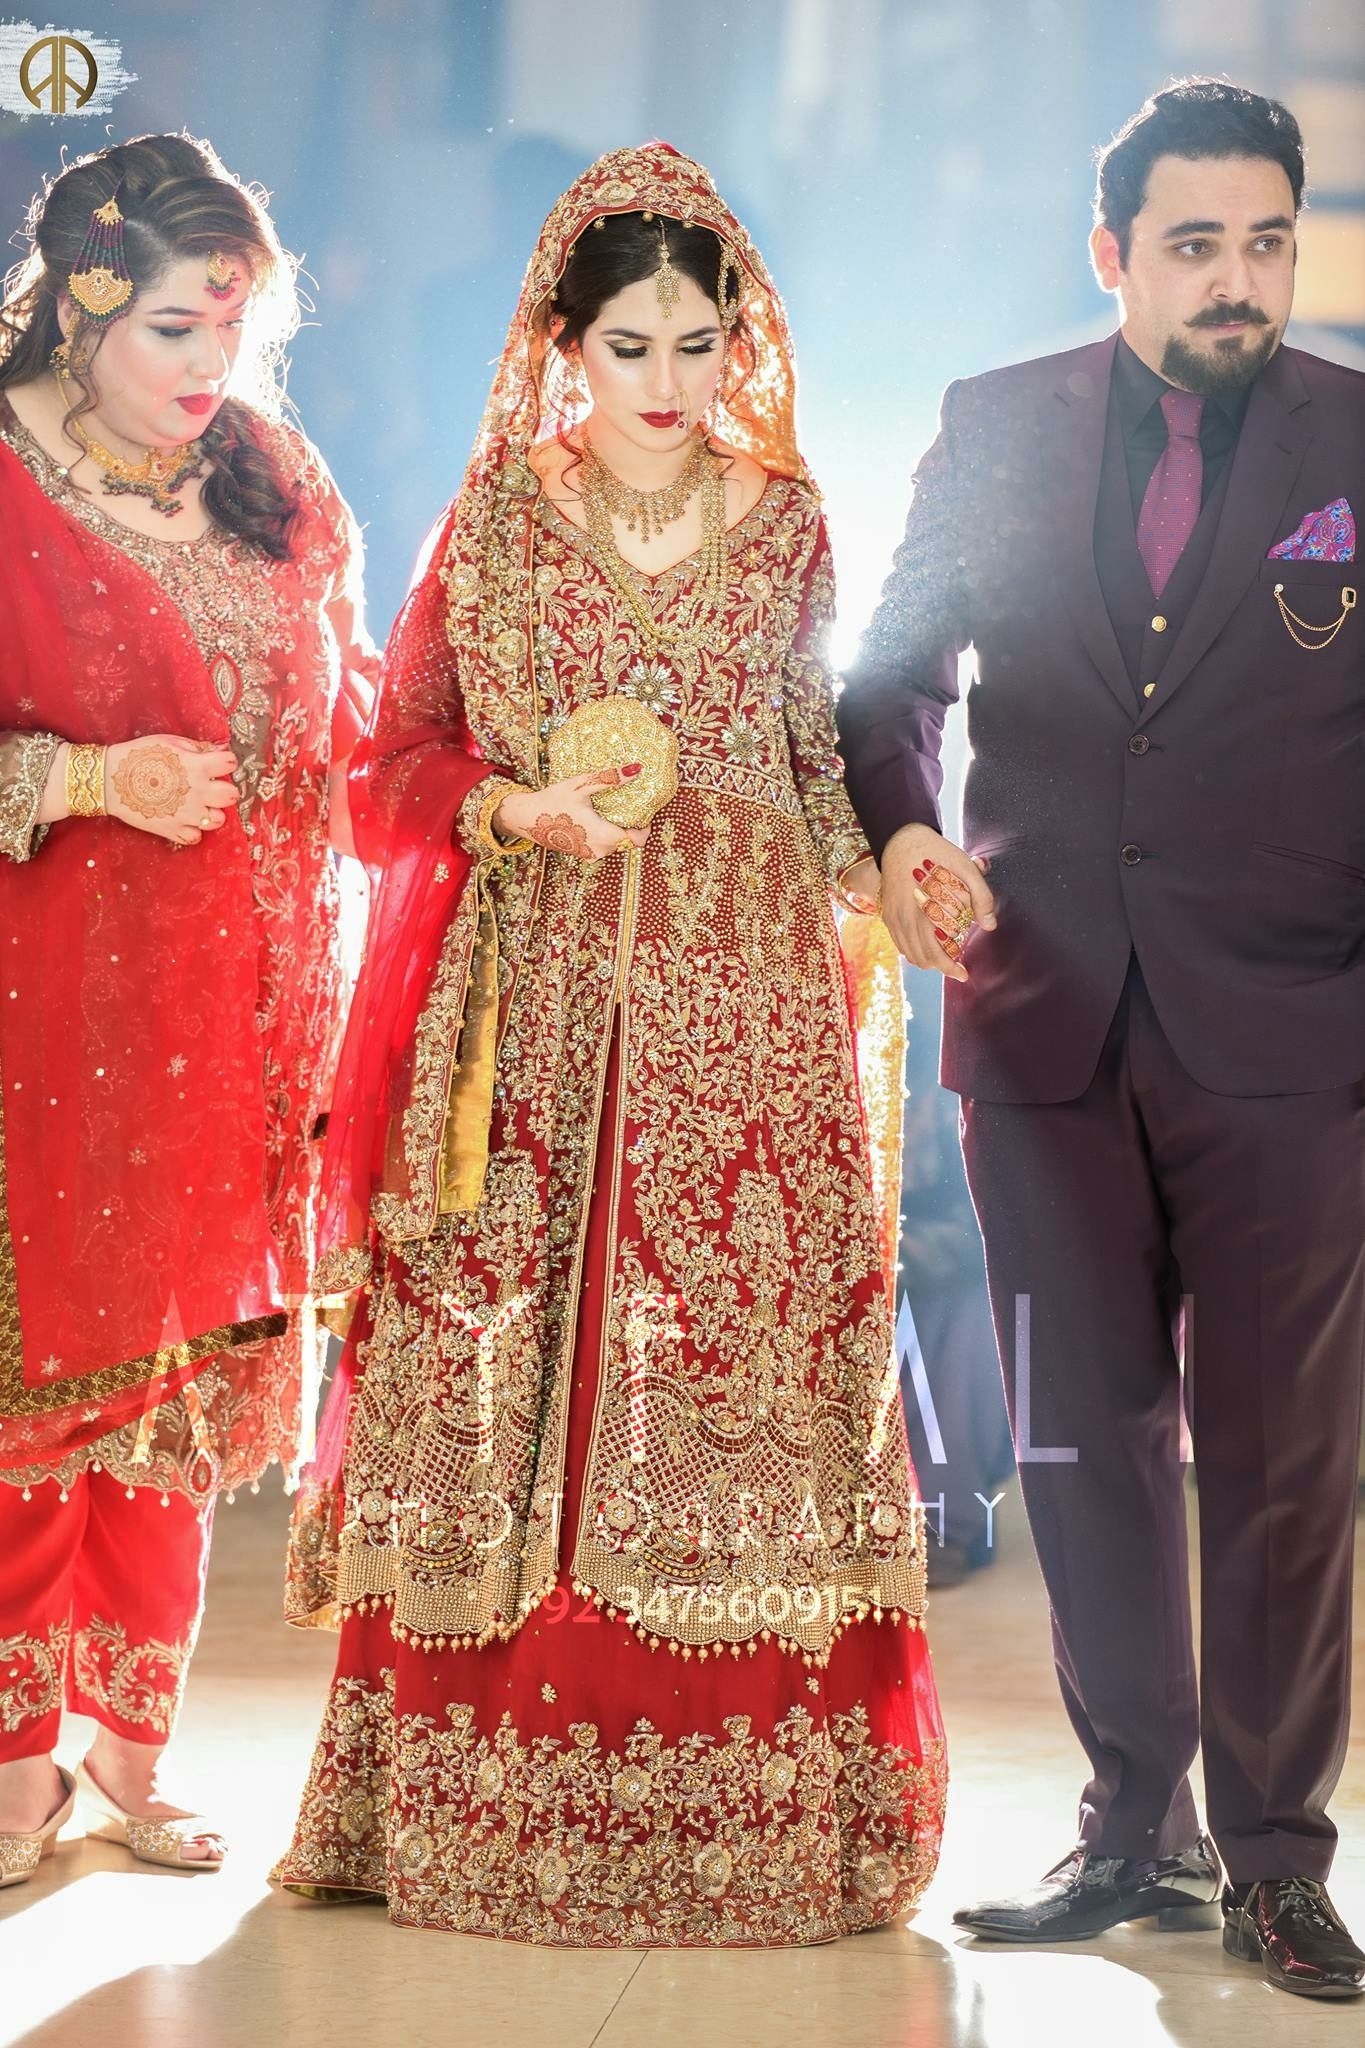 Rajput wedding dress  Pin by Inno Janjua Rajput on Bride wear  Pinterest  Pakistani